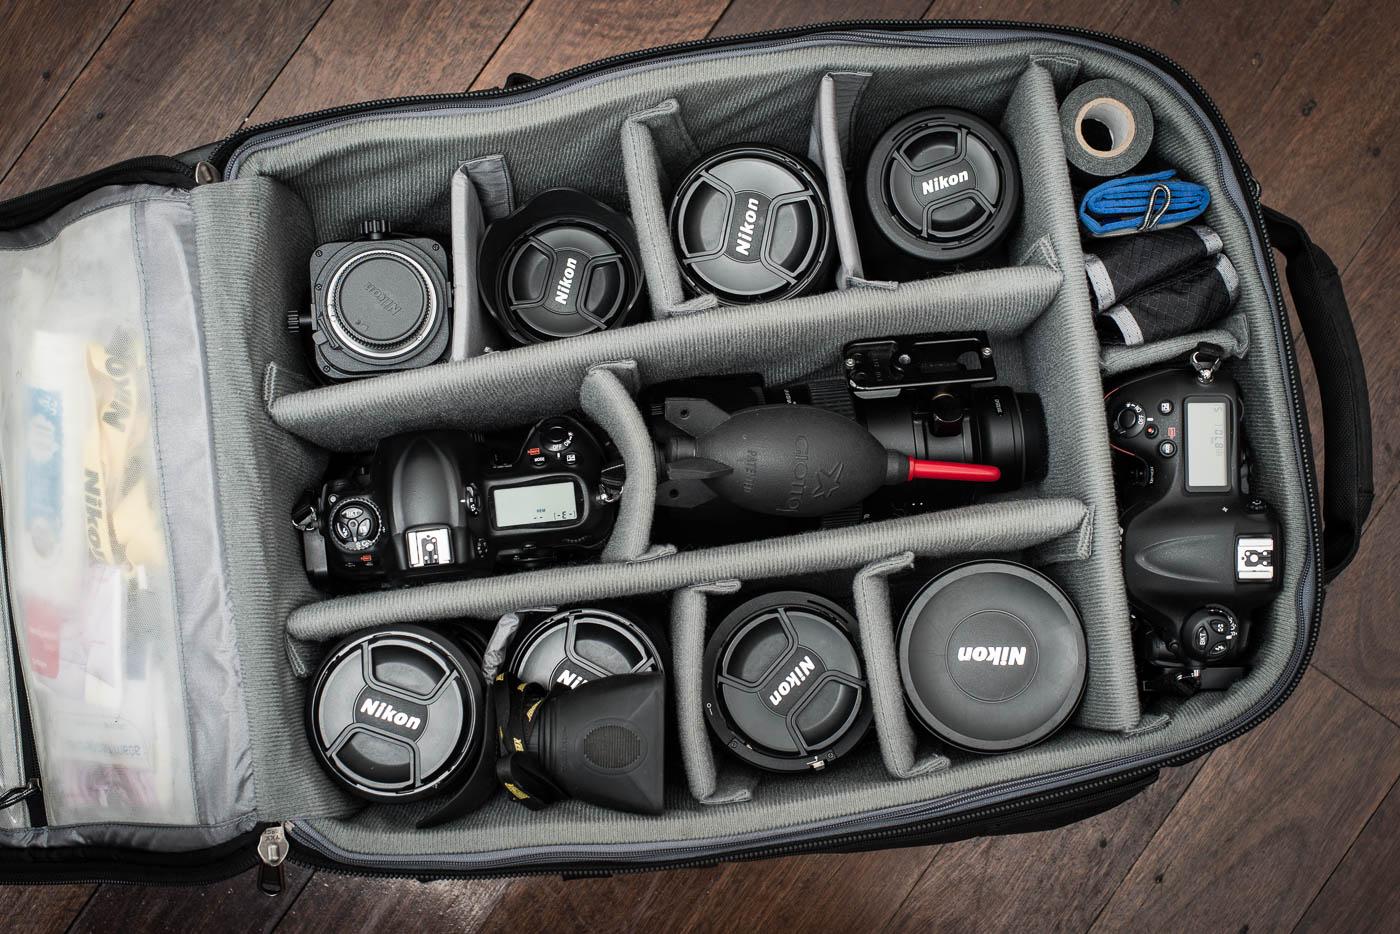 Gavin Jowitt's camera bag